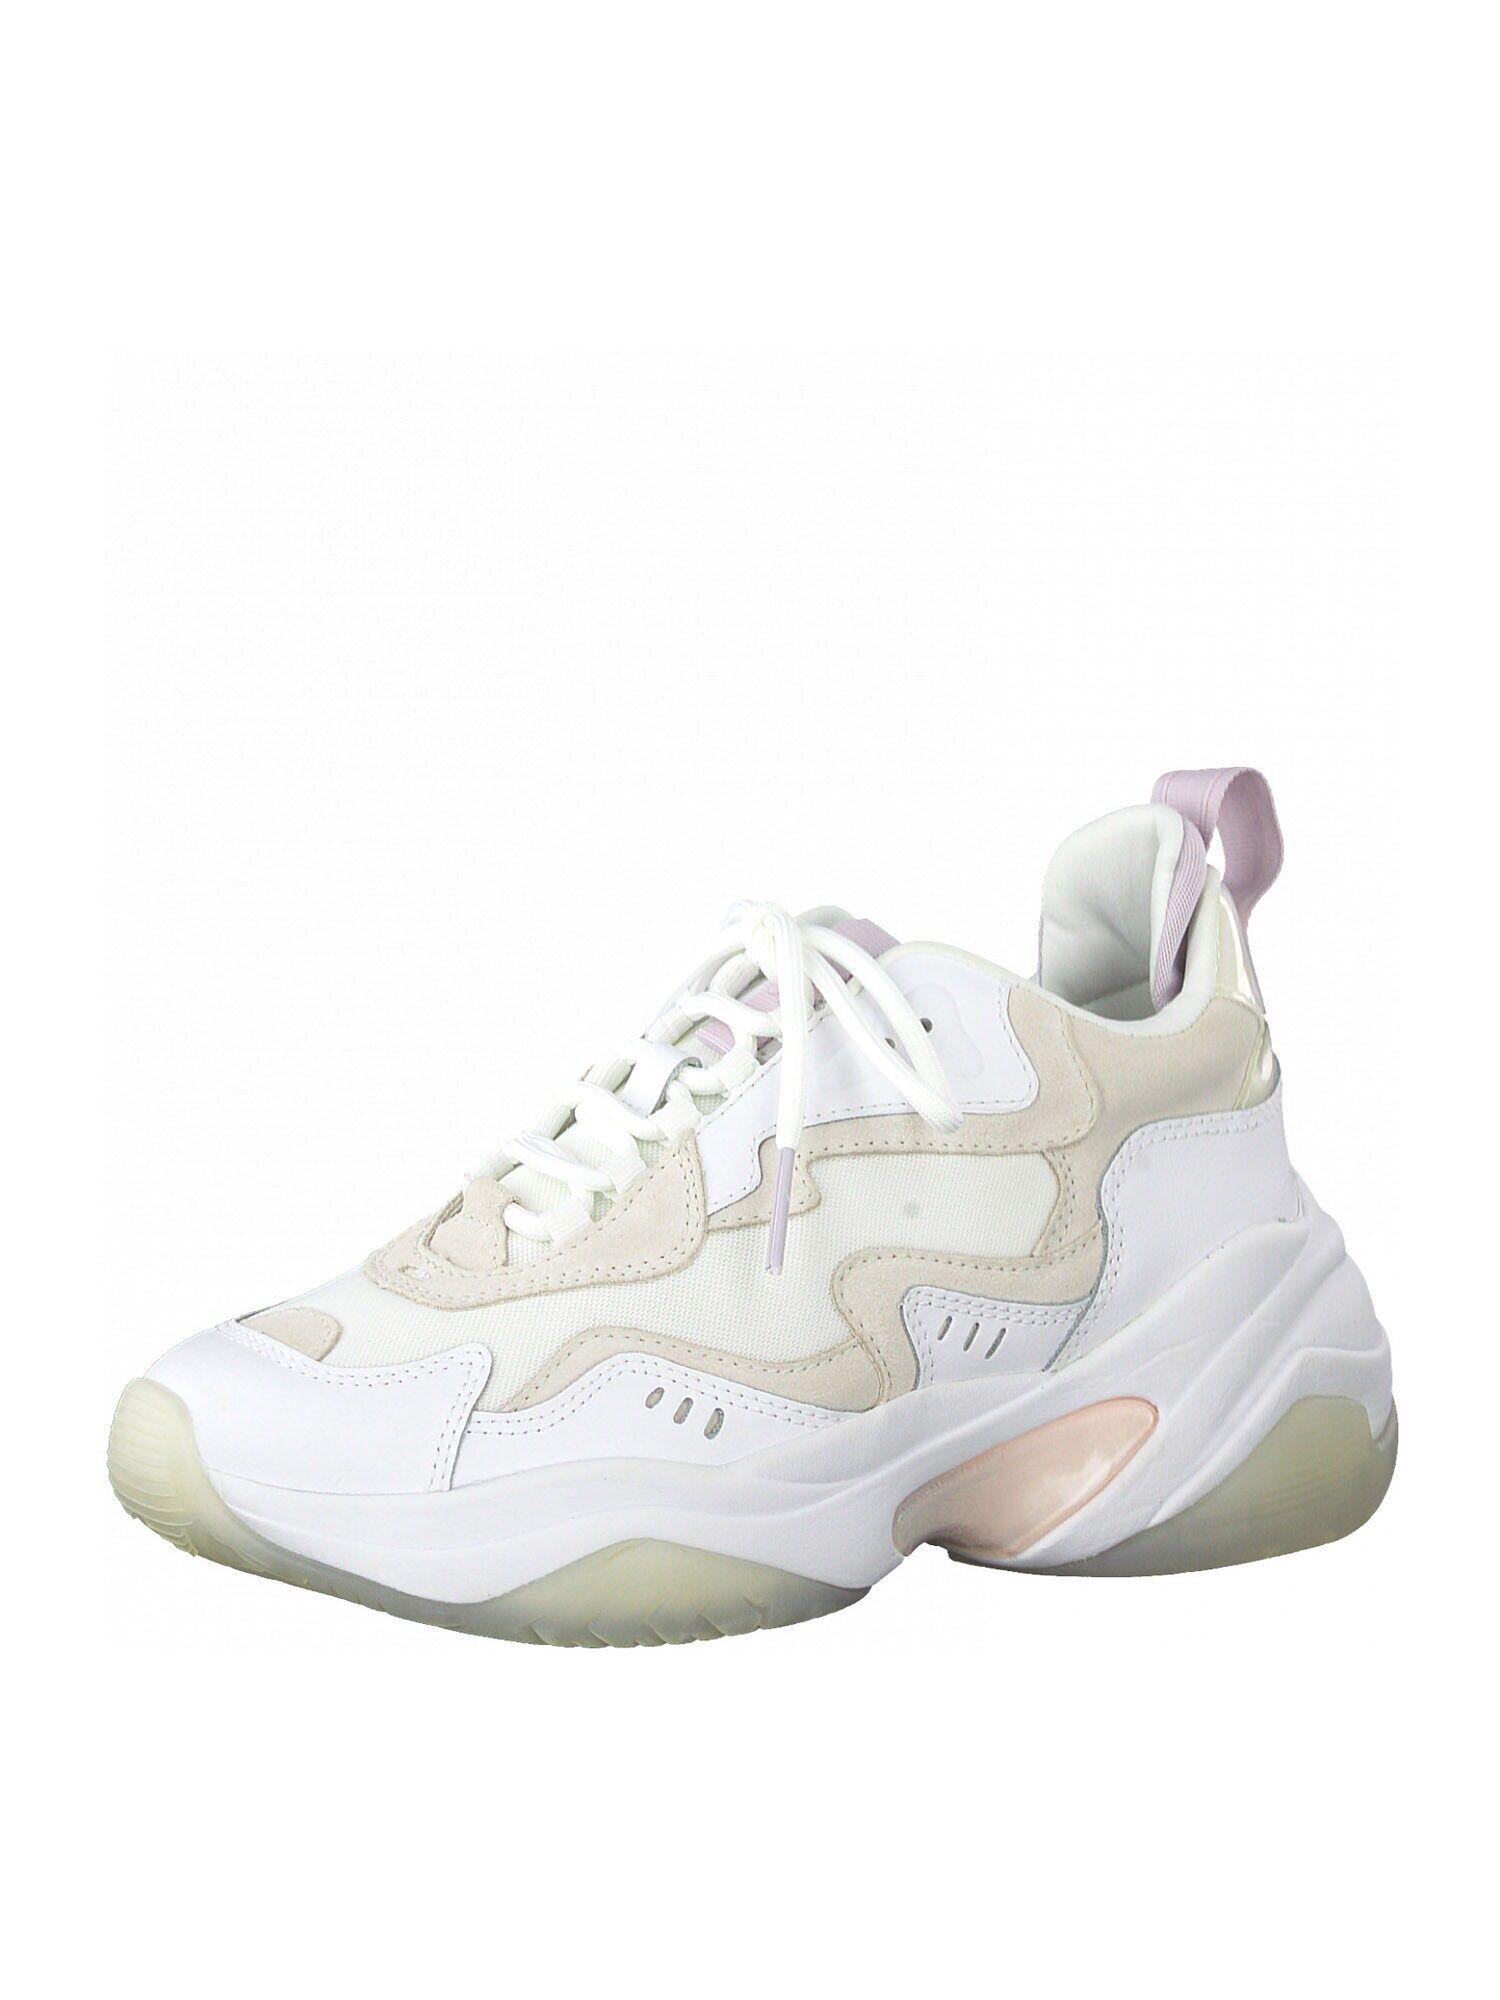 Tamaris Fashletics Baskets basses  - Blanc - Taille: 40 - female